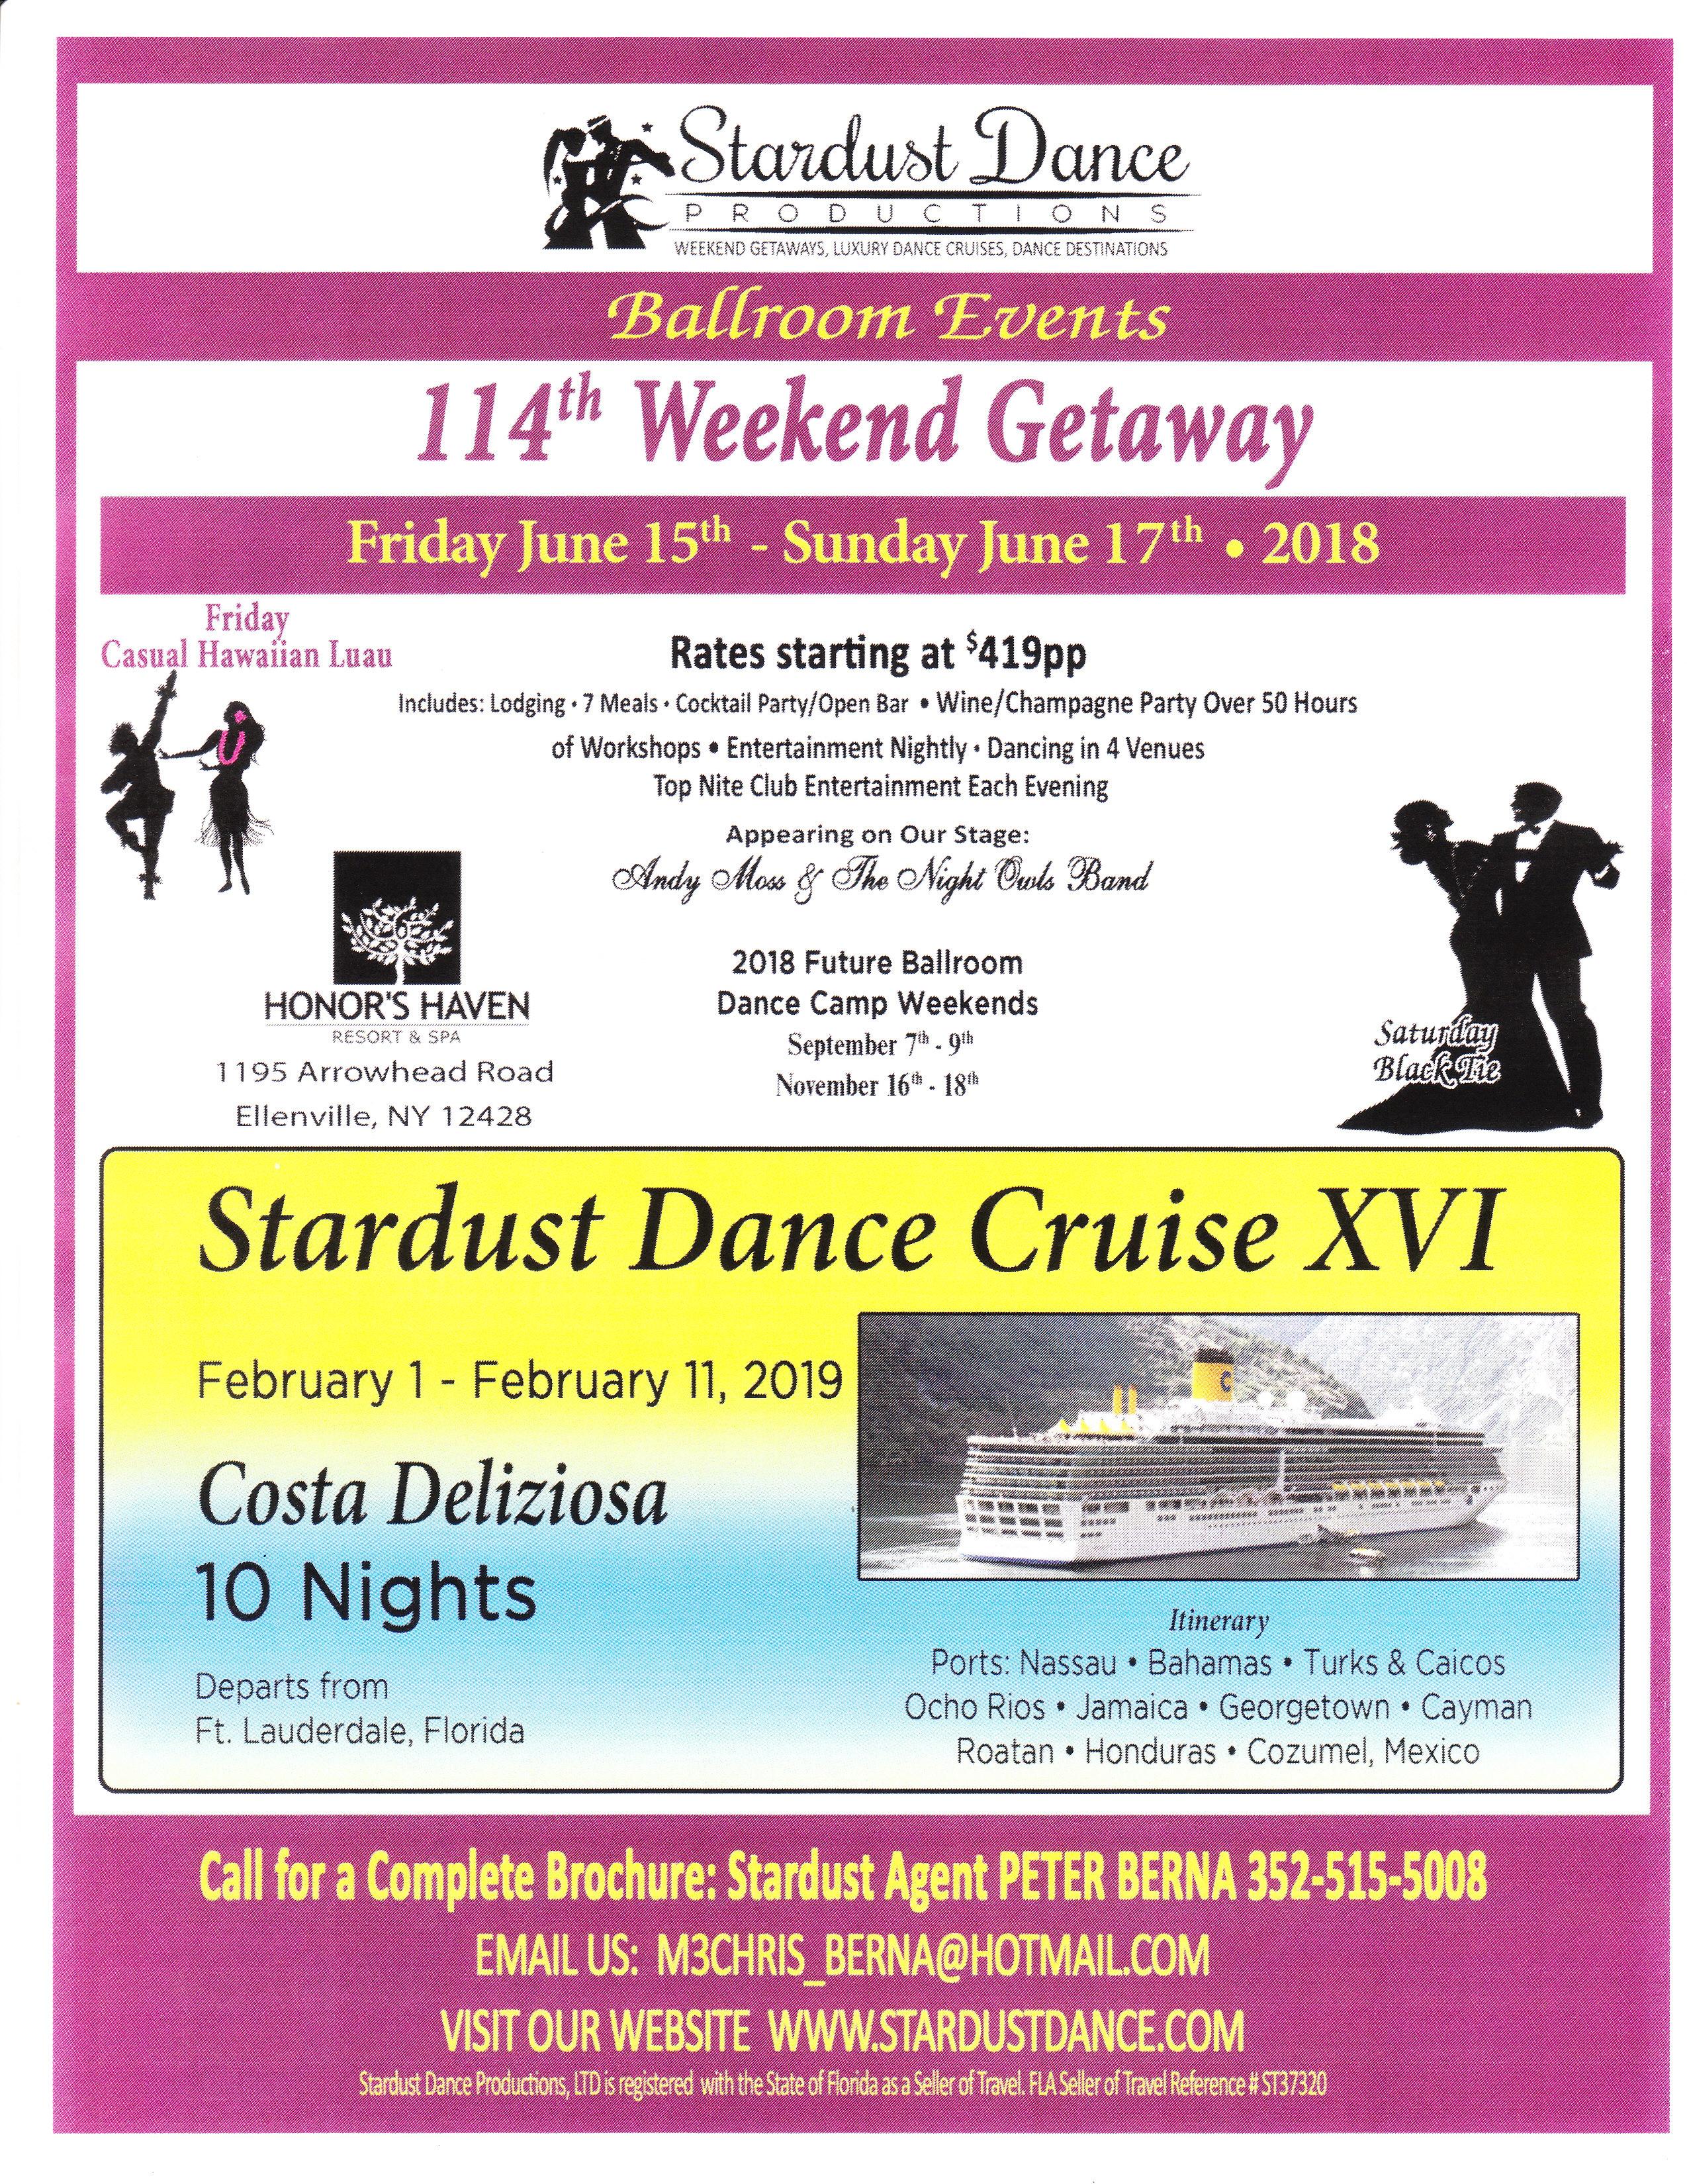 Stardust 2019 Cruise